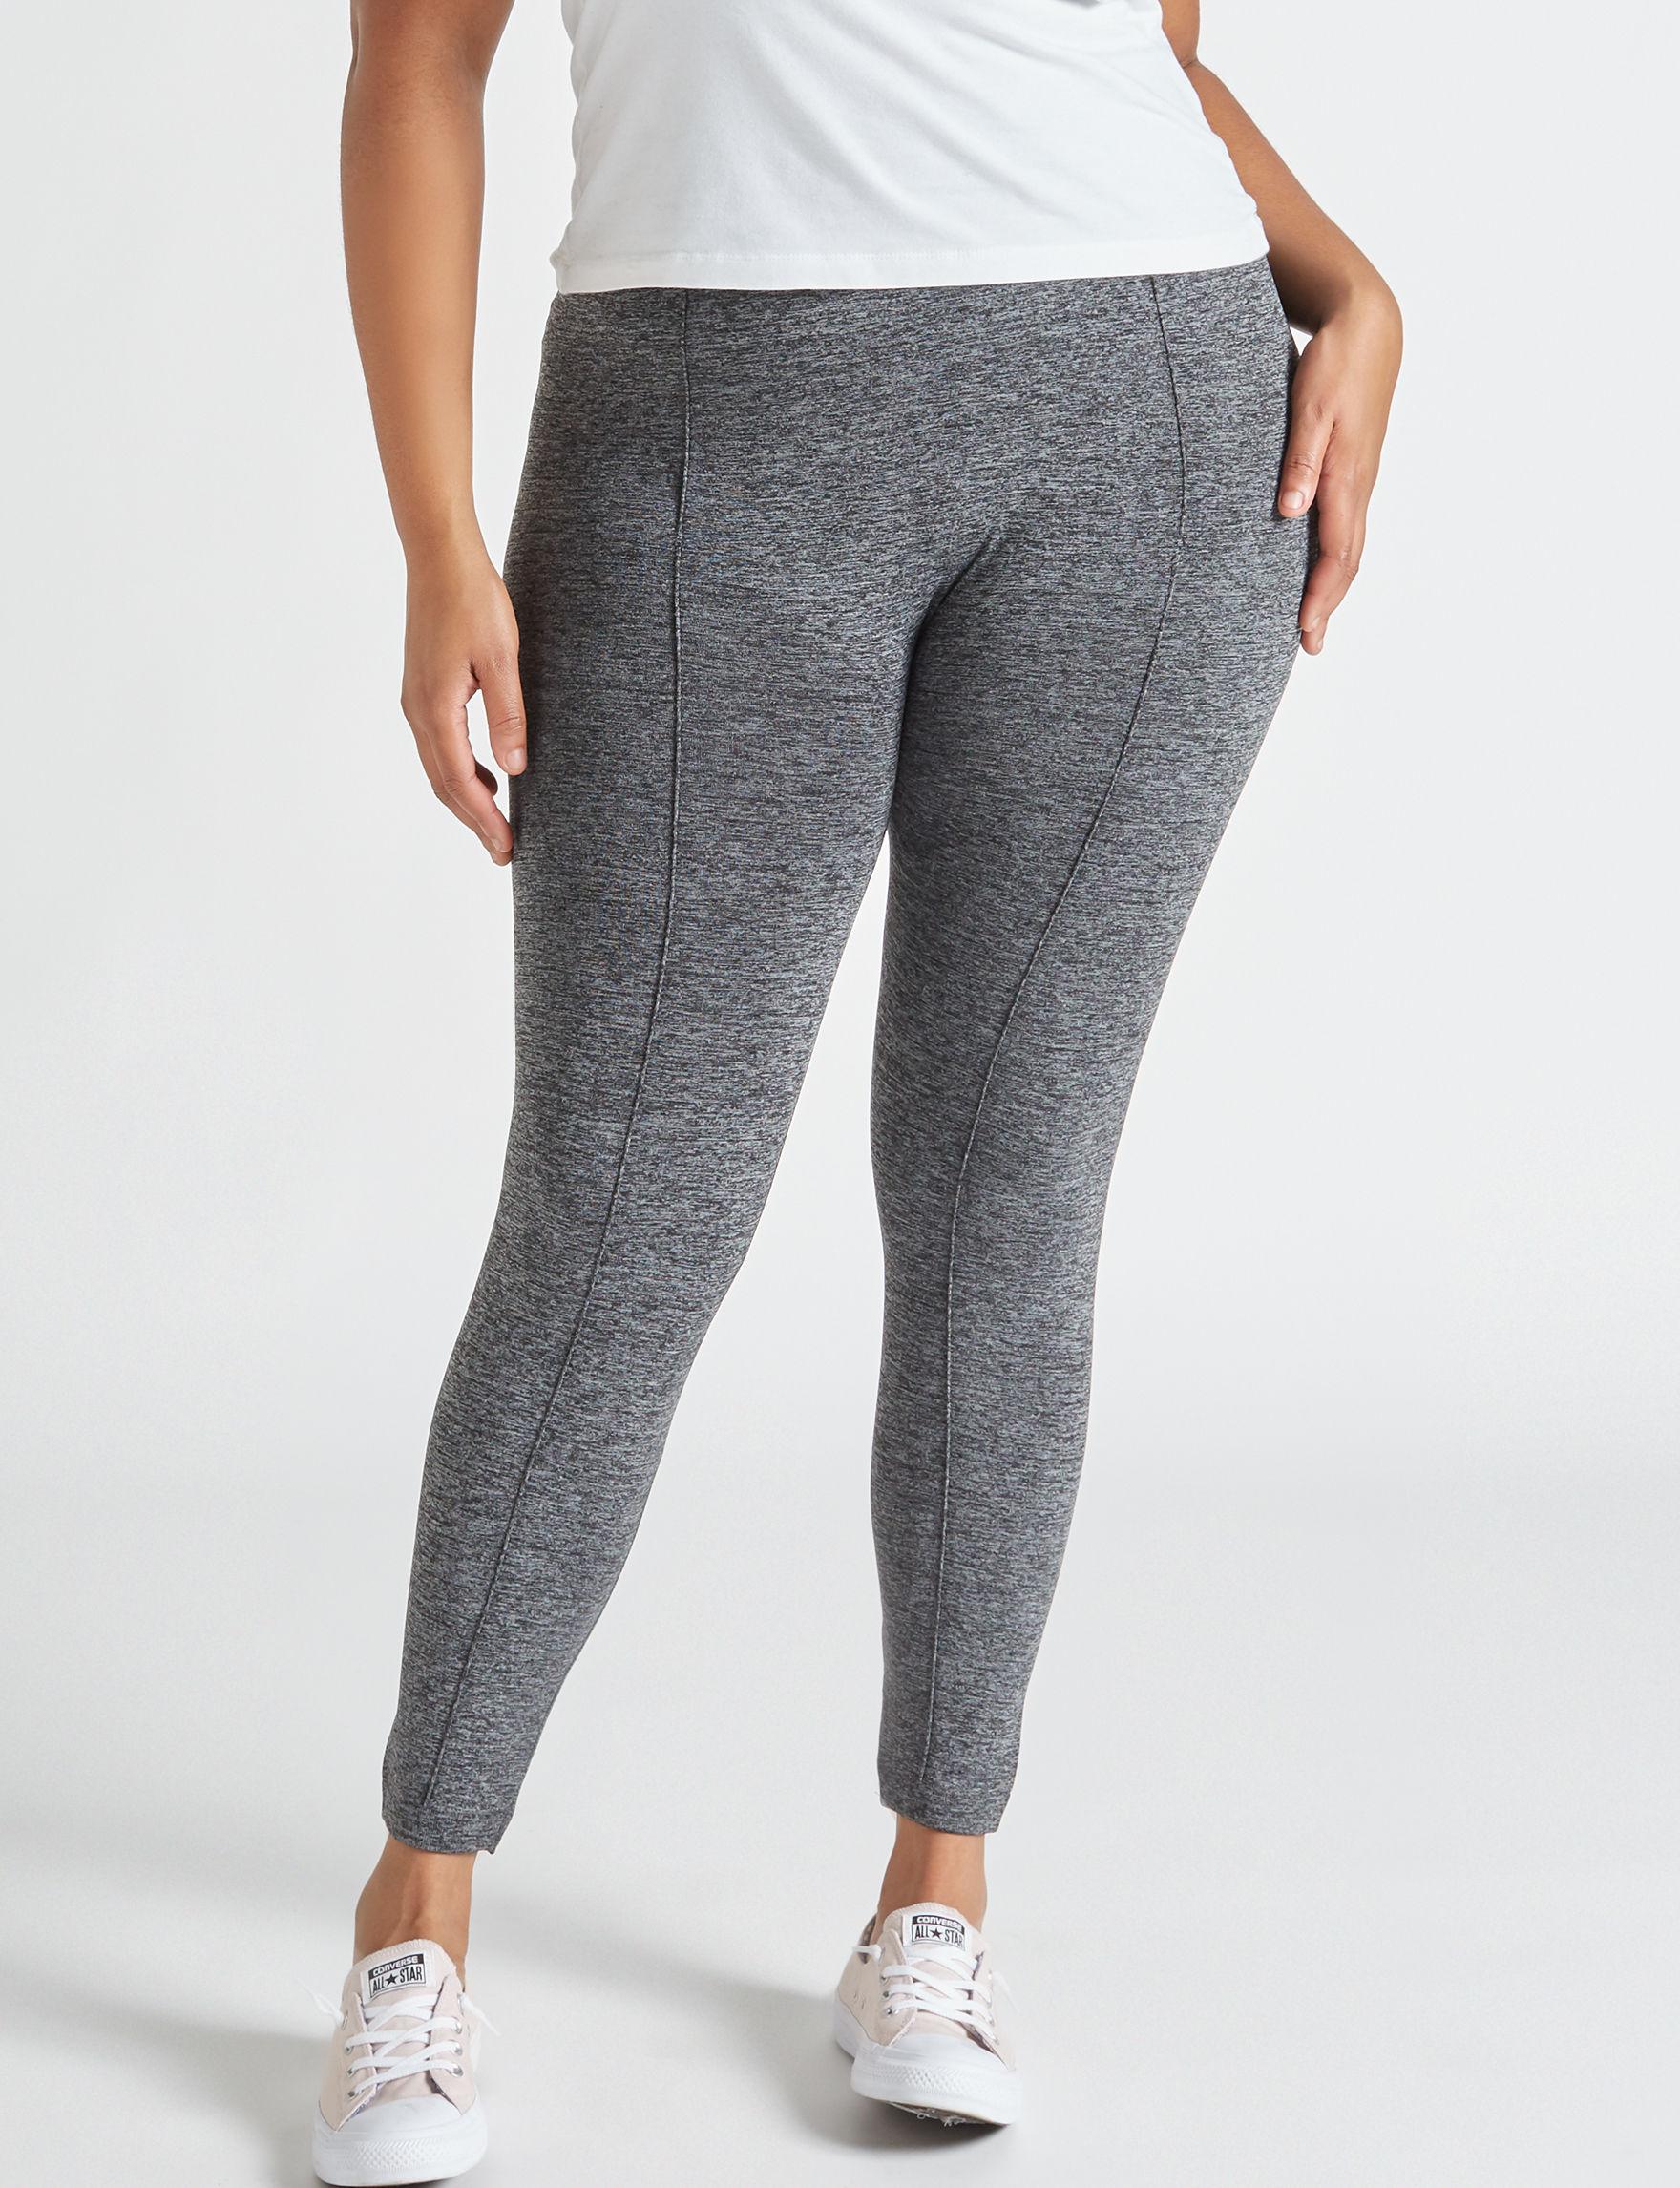 Glitz Grey Leggings